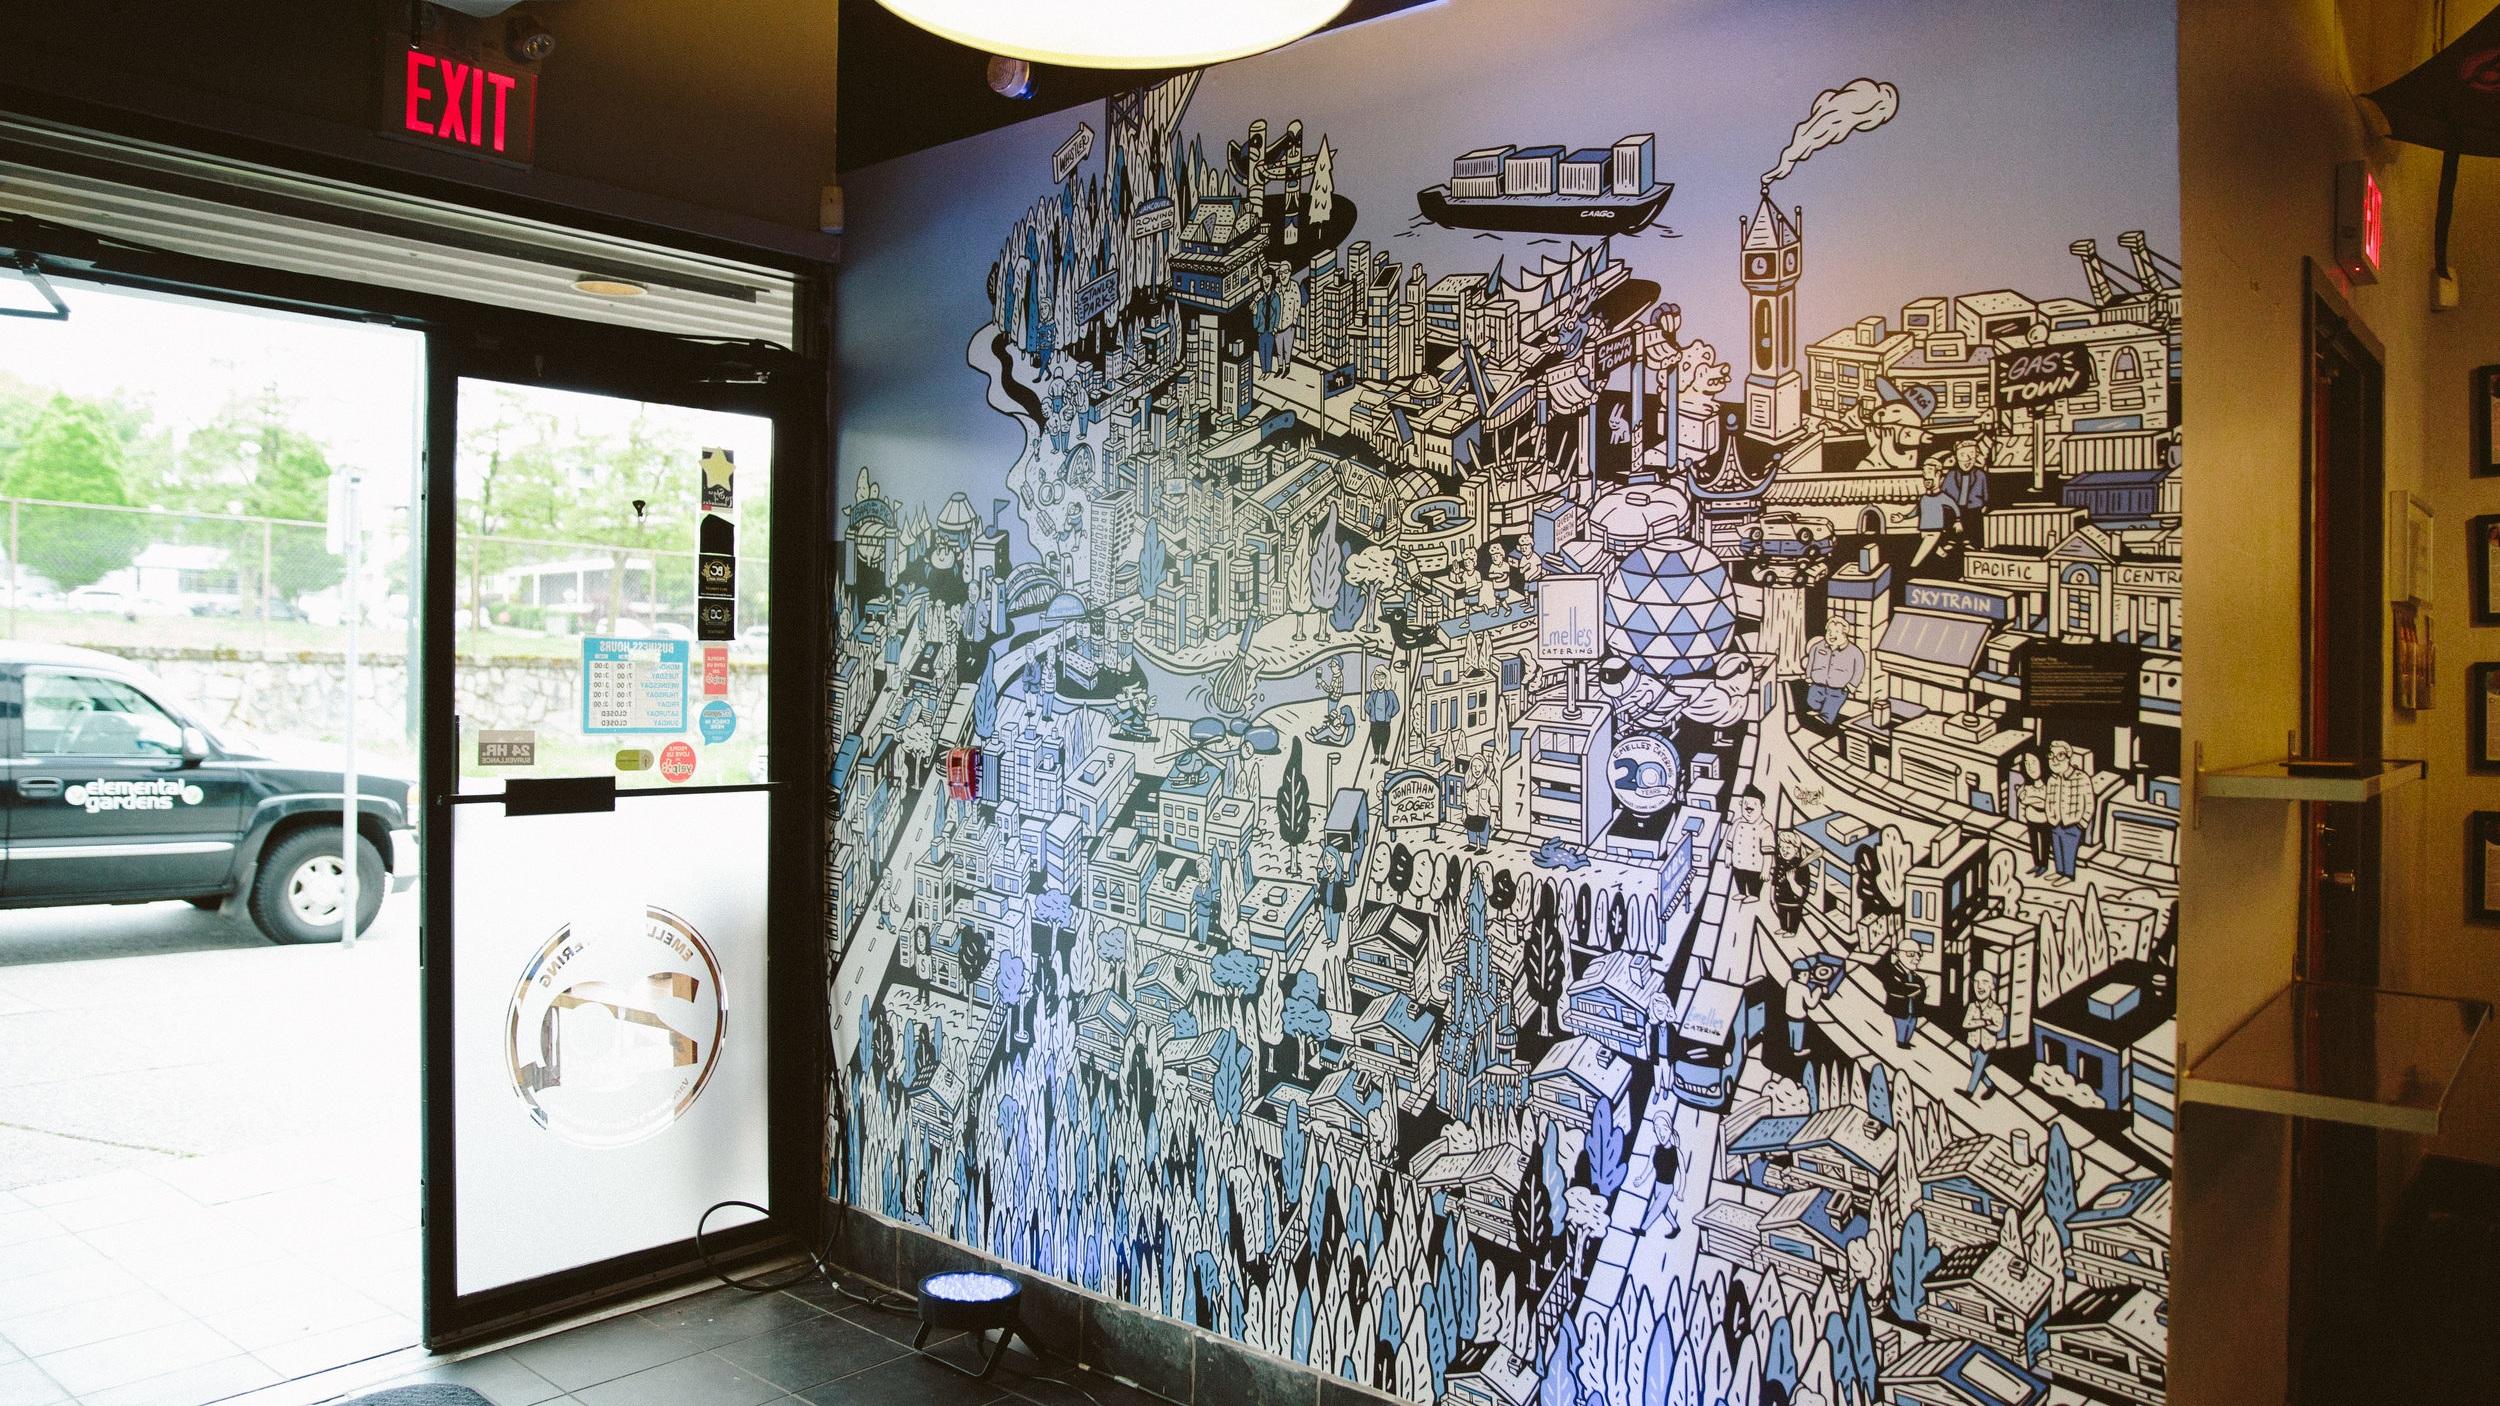 Emelle's Westside Kitchen - Mural installation for Emelle's Westside Kitchen, a local cafe and catering company.